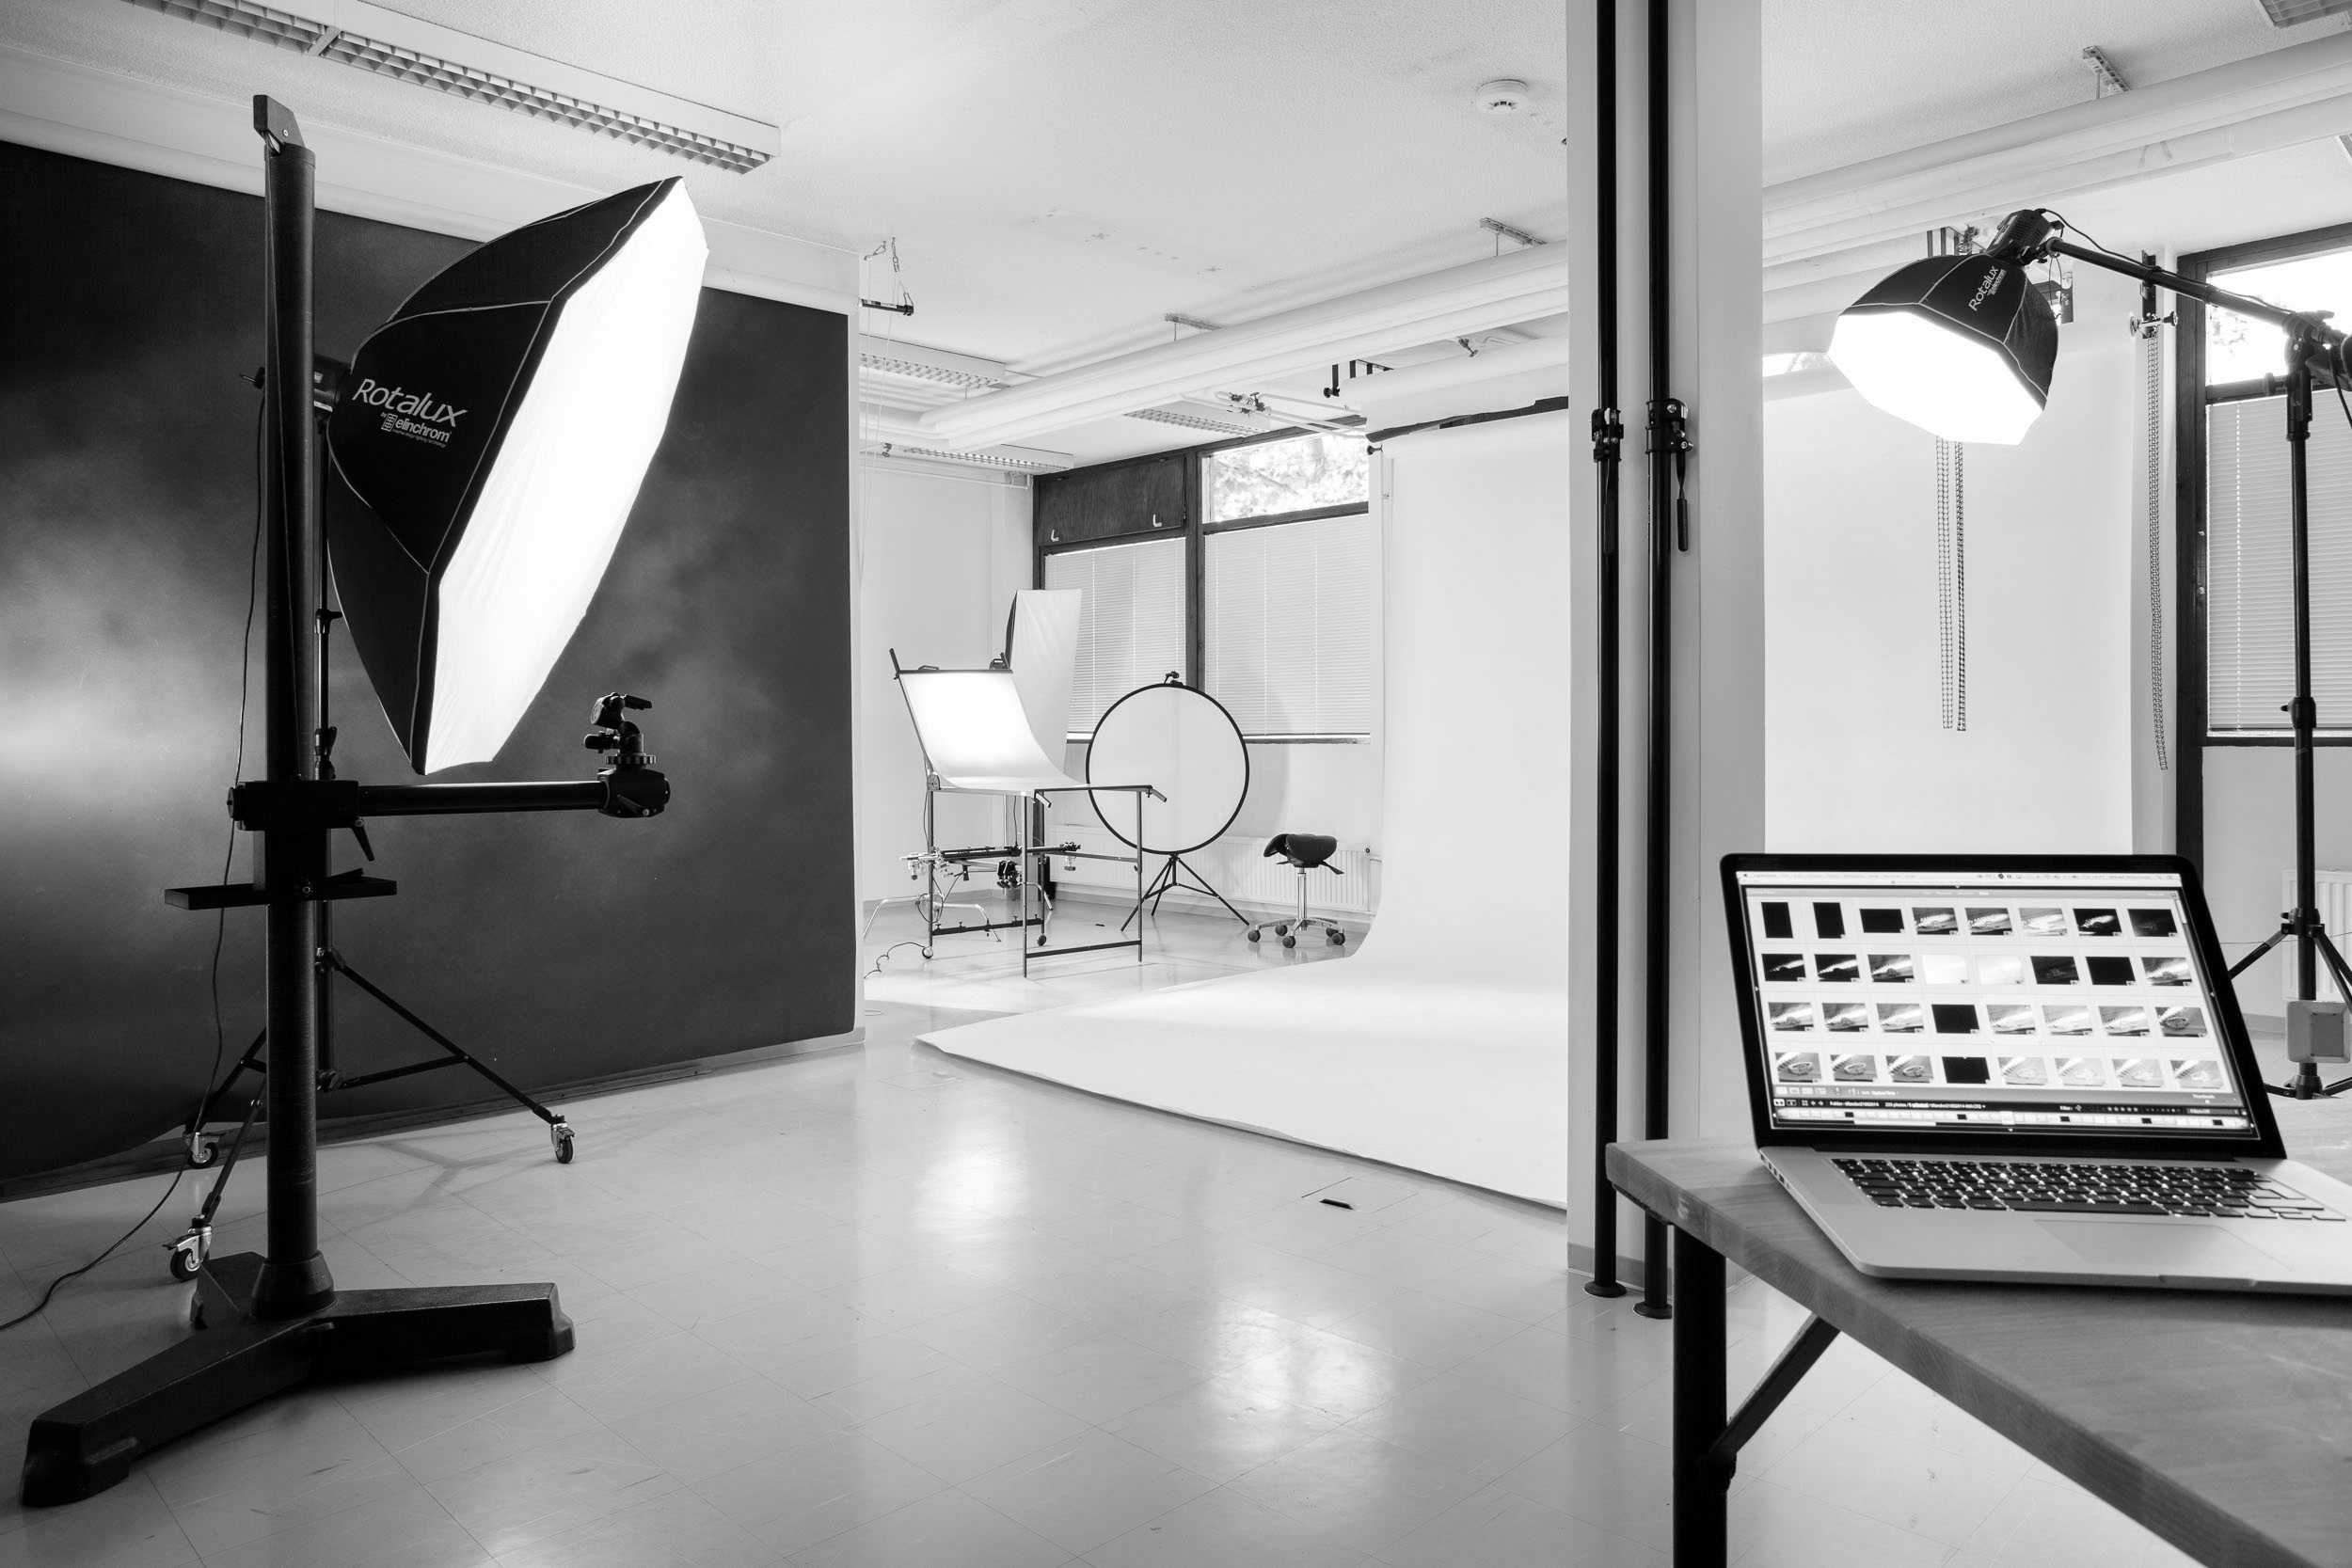 studio_espoo_bw.jpg